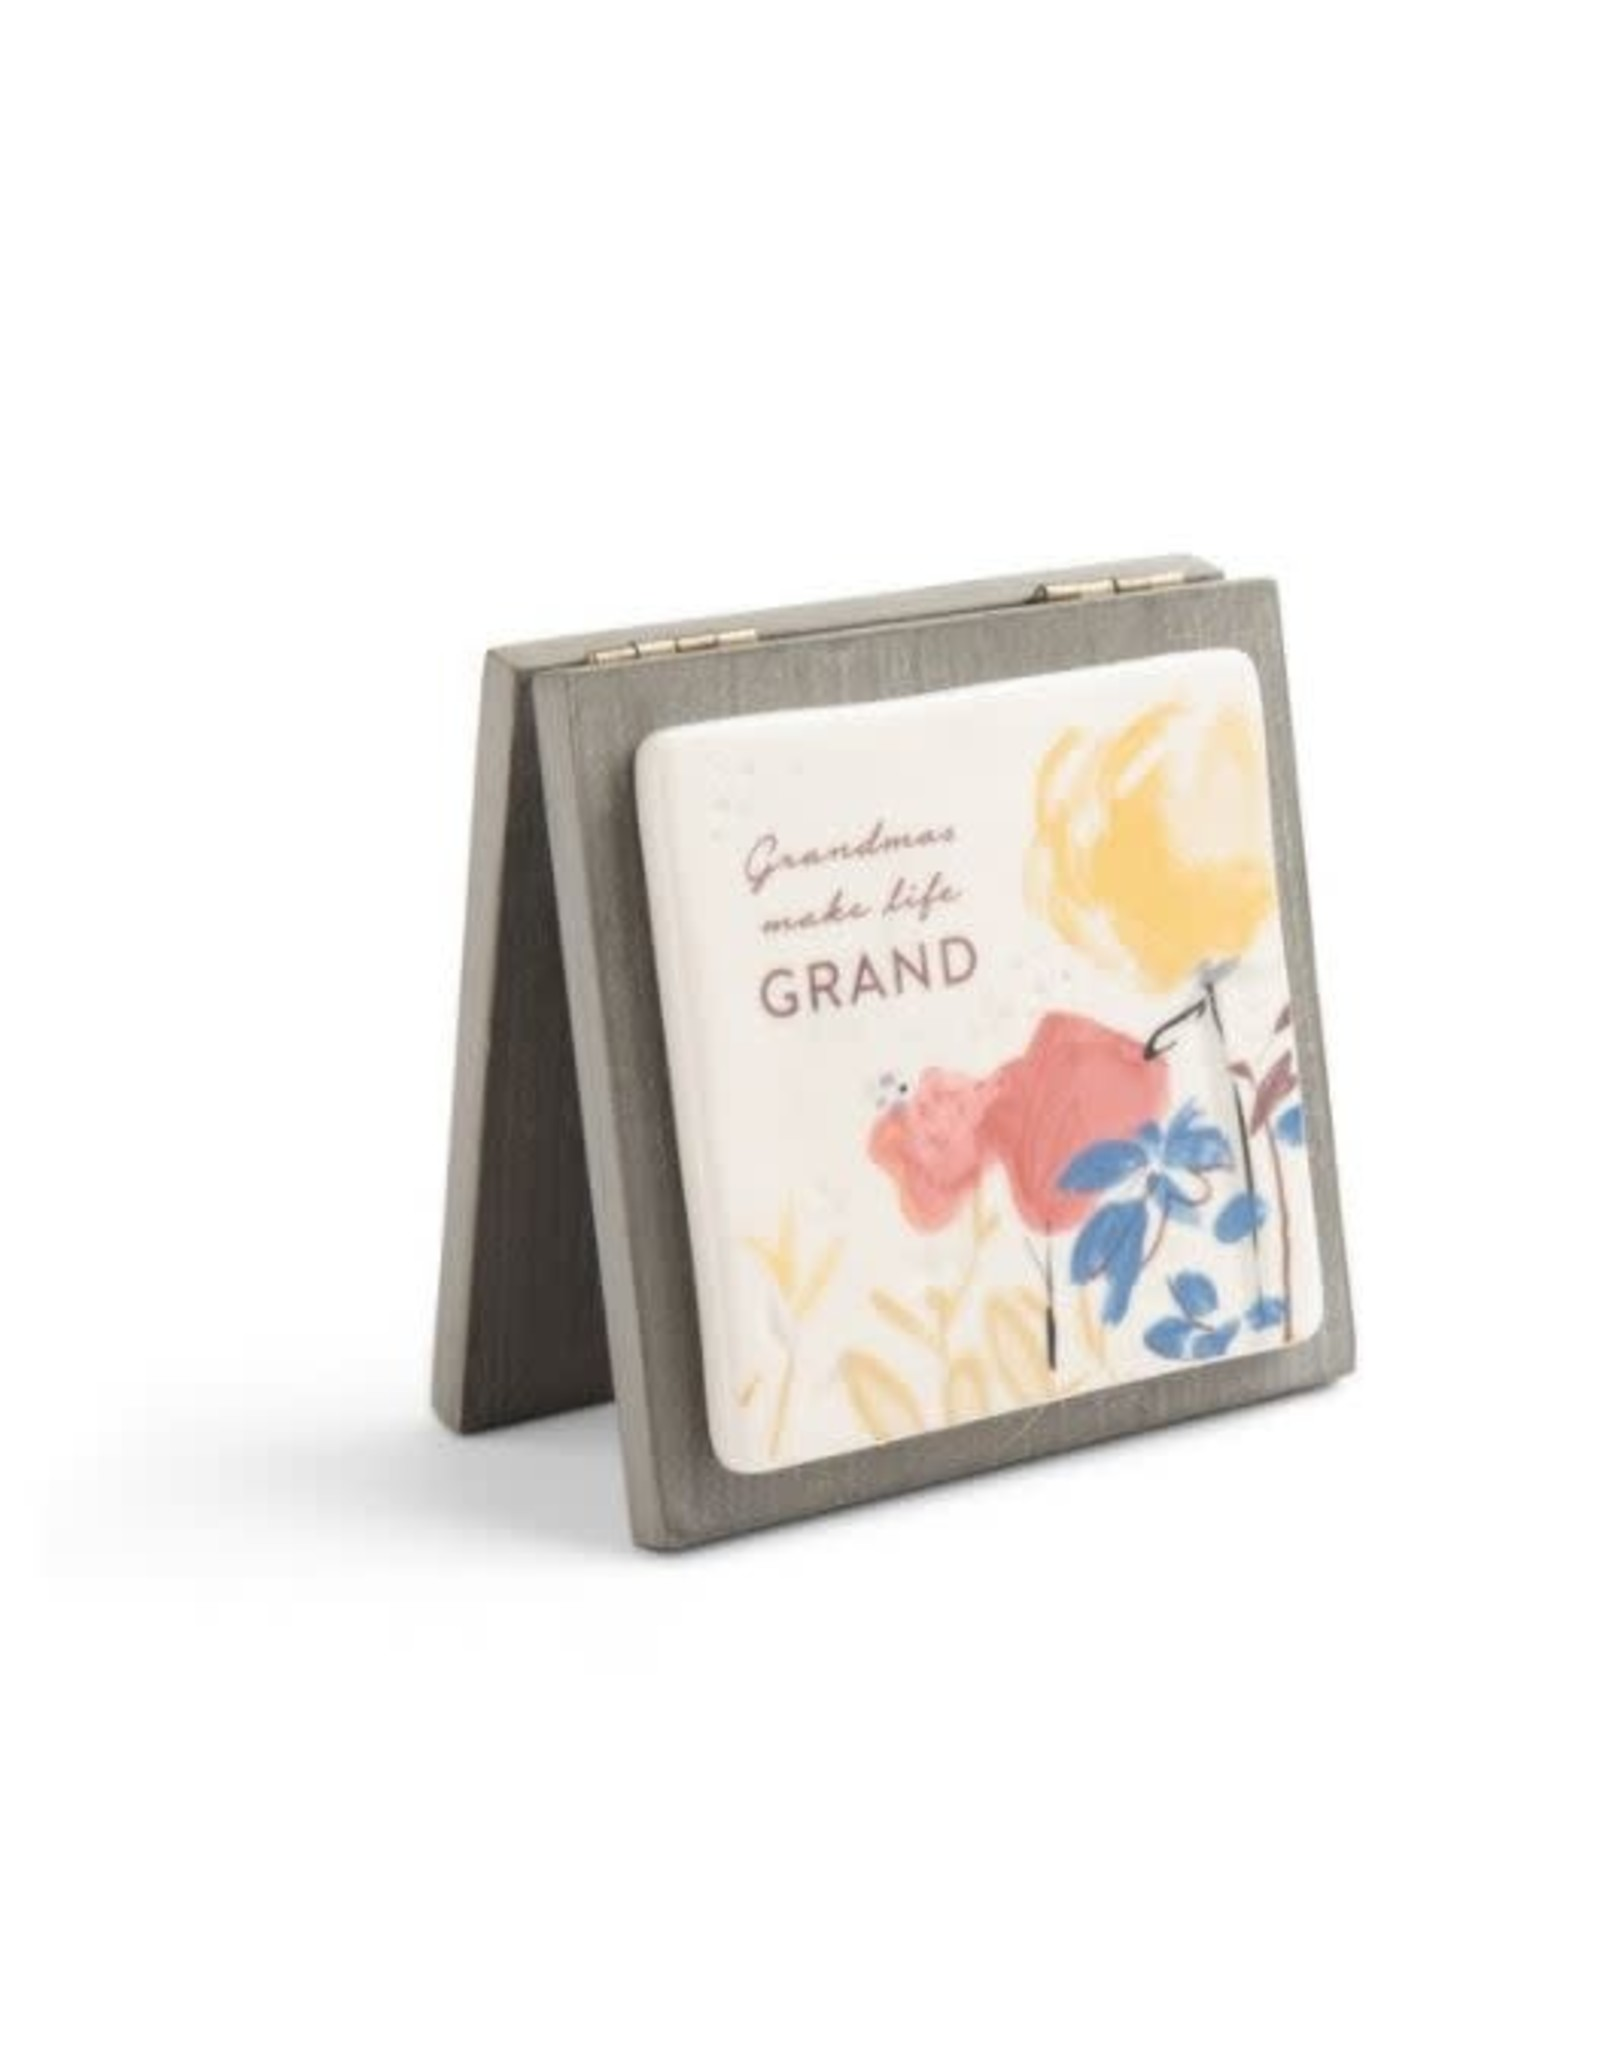 Demdaco GRAND FOREVER CARD